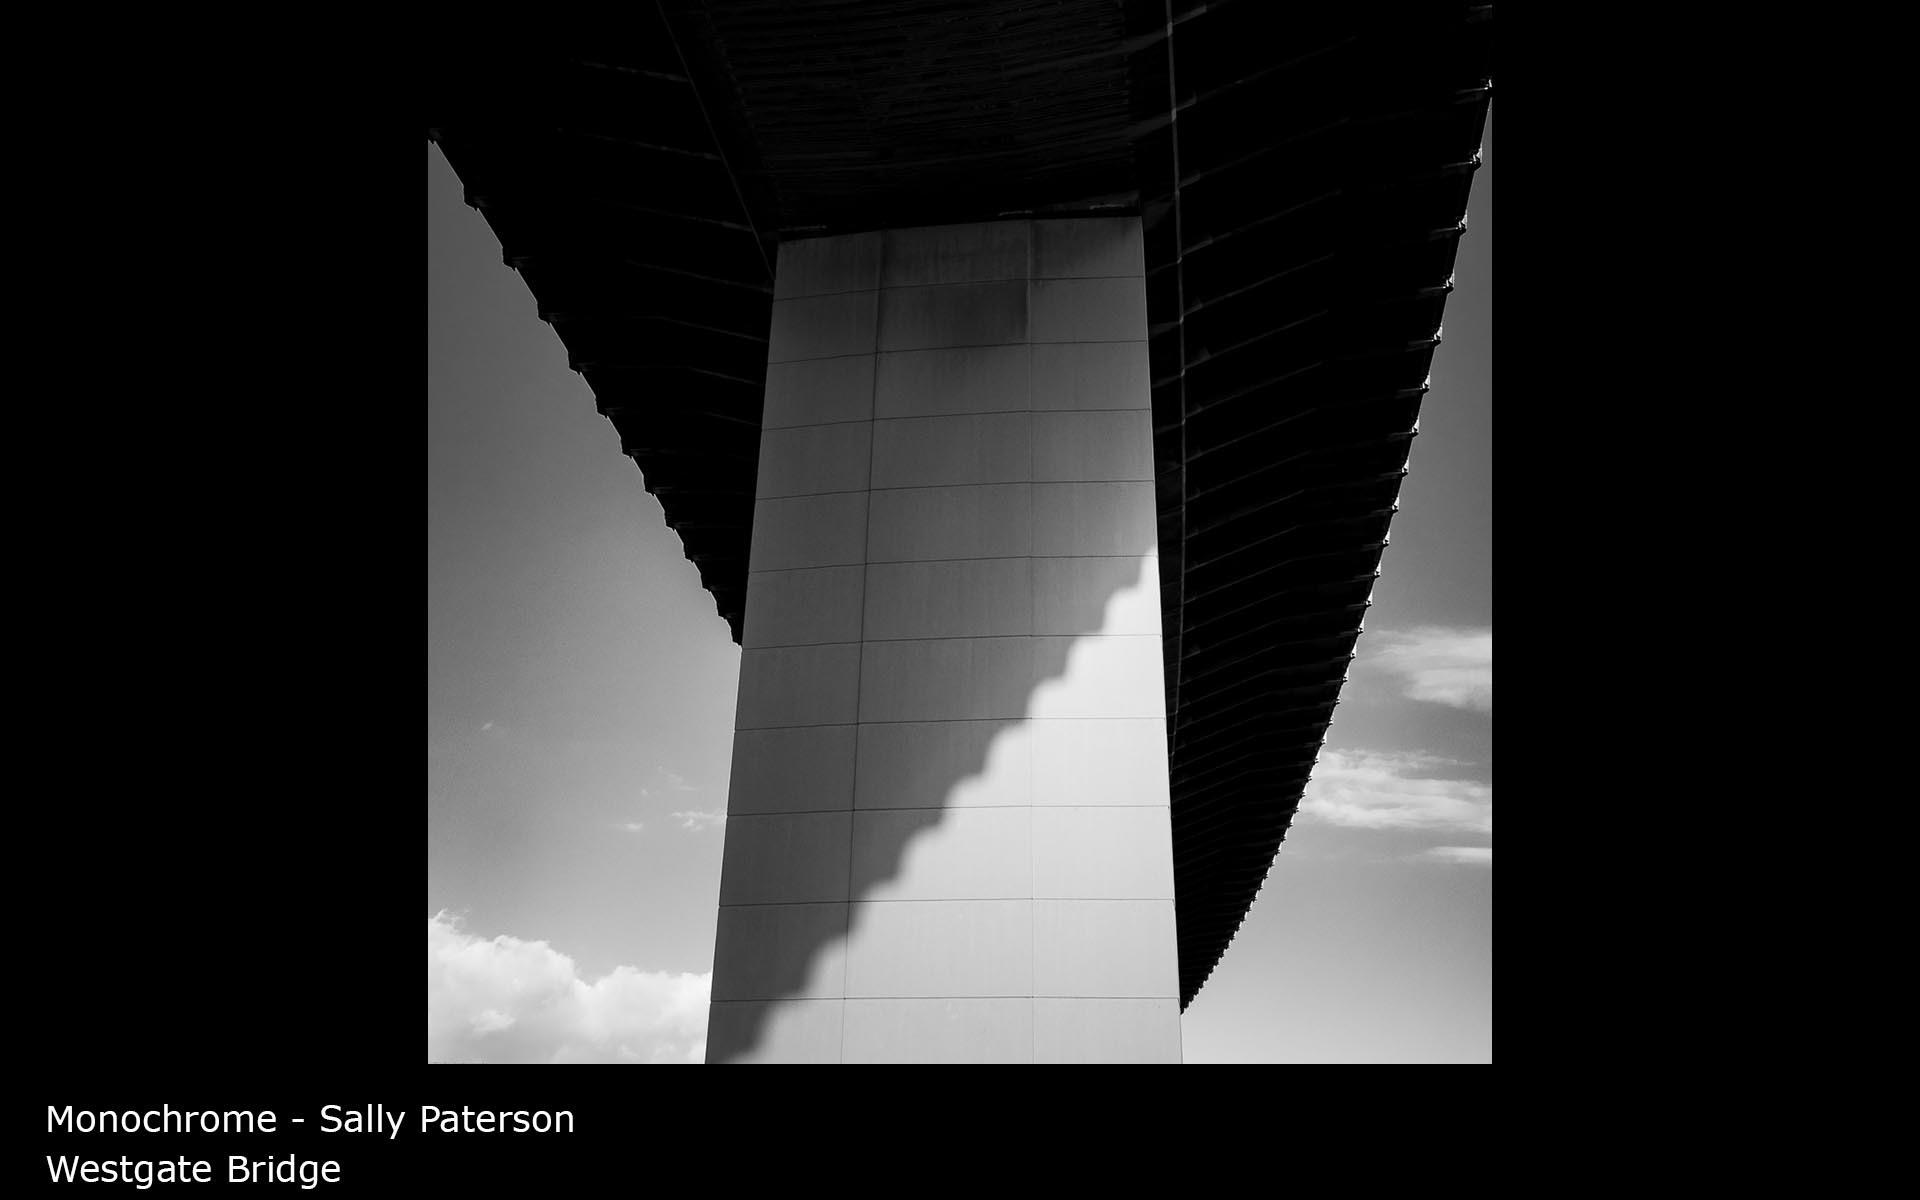 Westgate Bridge - Sally Paterson